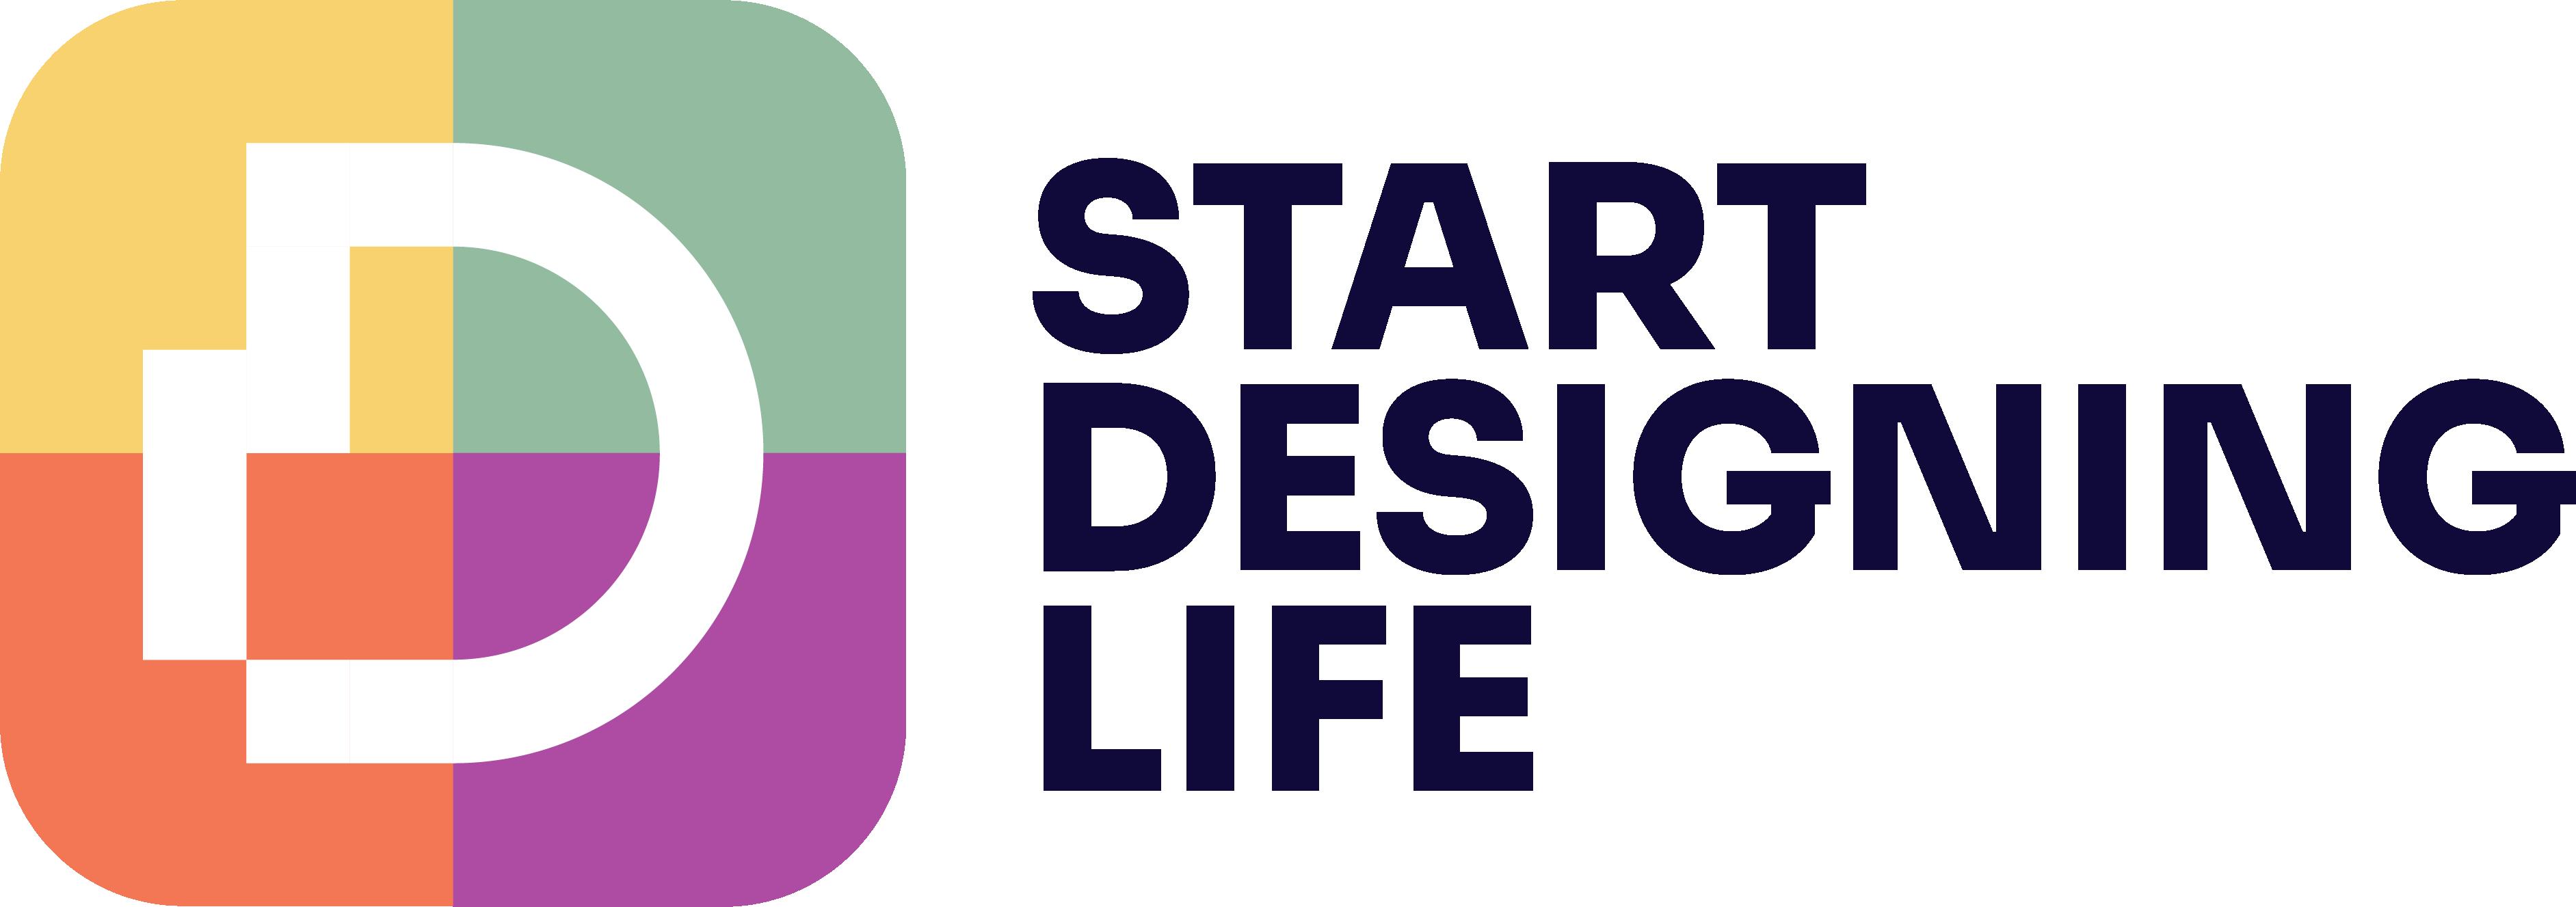 startdesigninglife.com